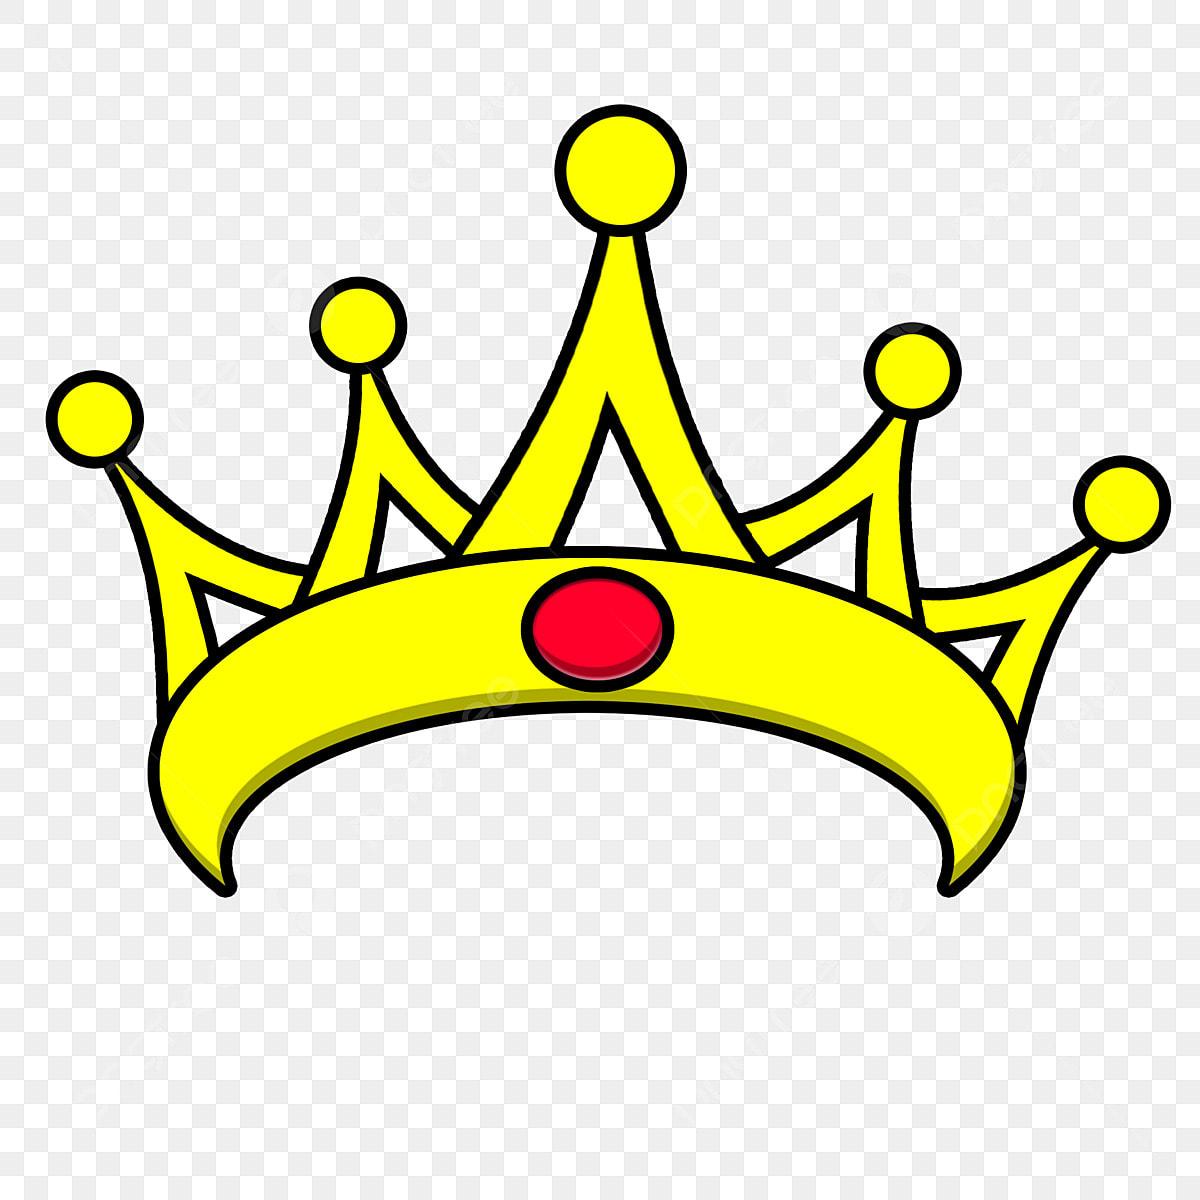 Dibujos Animados Honor Reina Princesa Corona Pintado A Mano